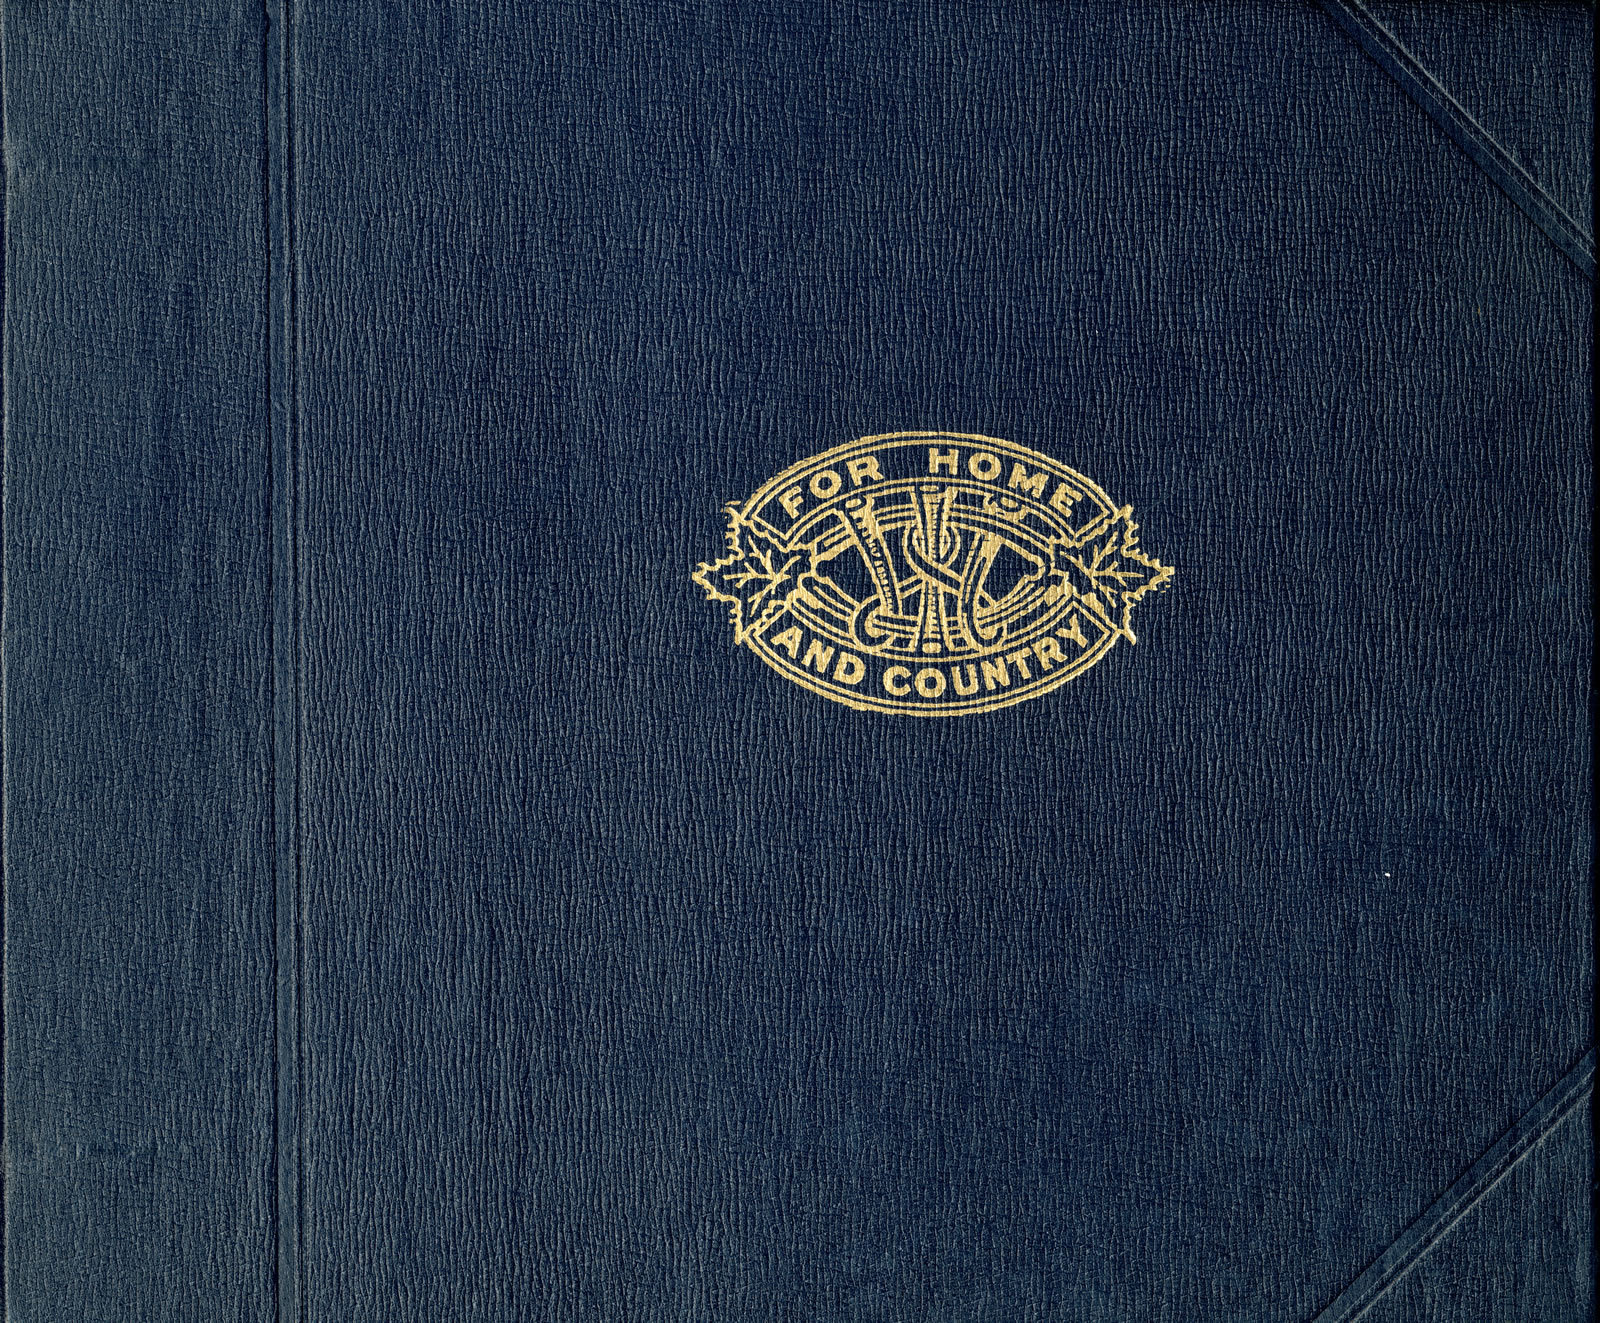 Aldershot Tweedsmuir Histories, Volume 2 [of 2 vols.]